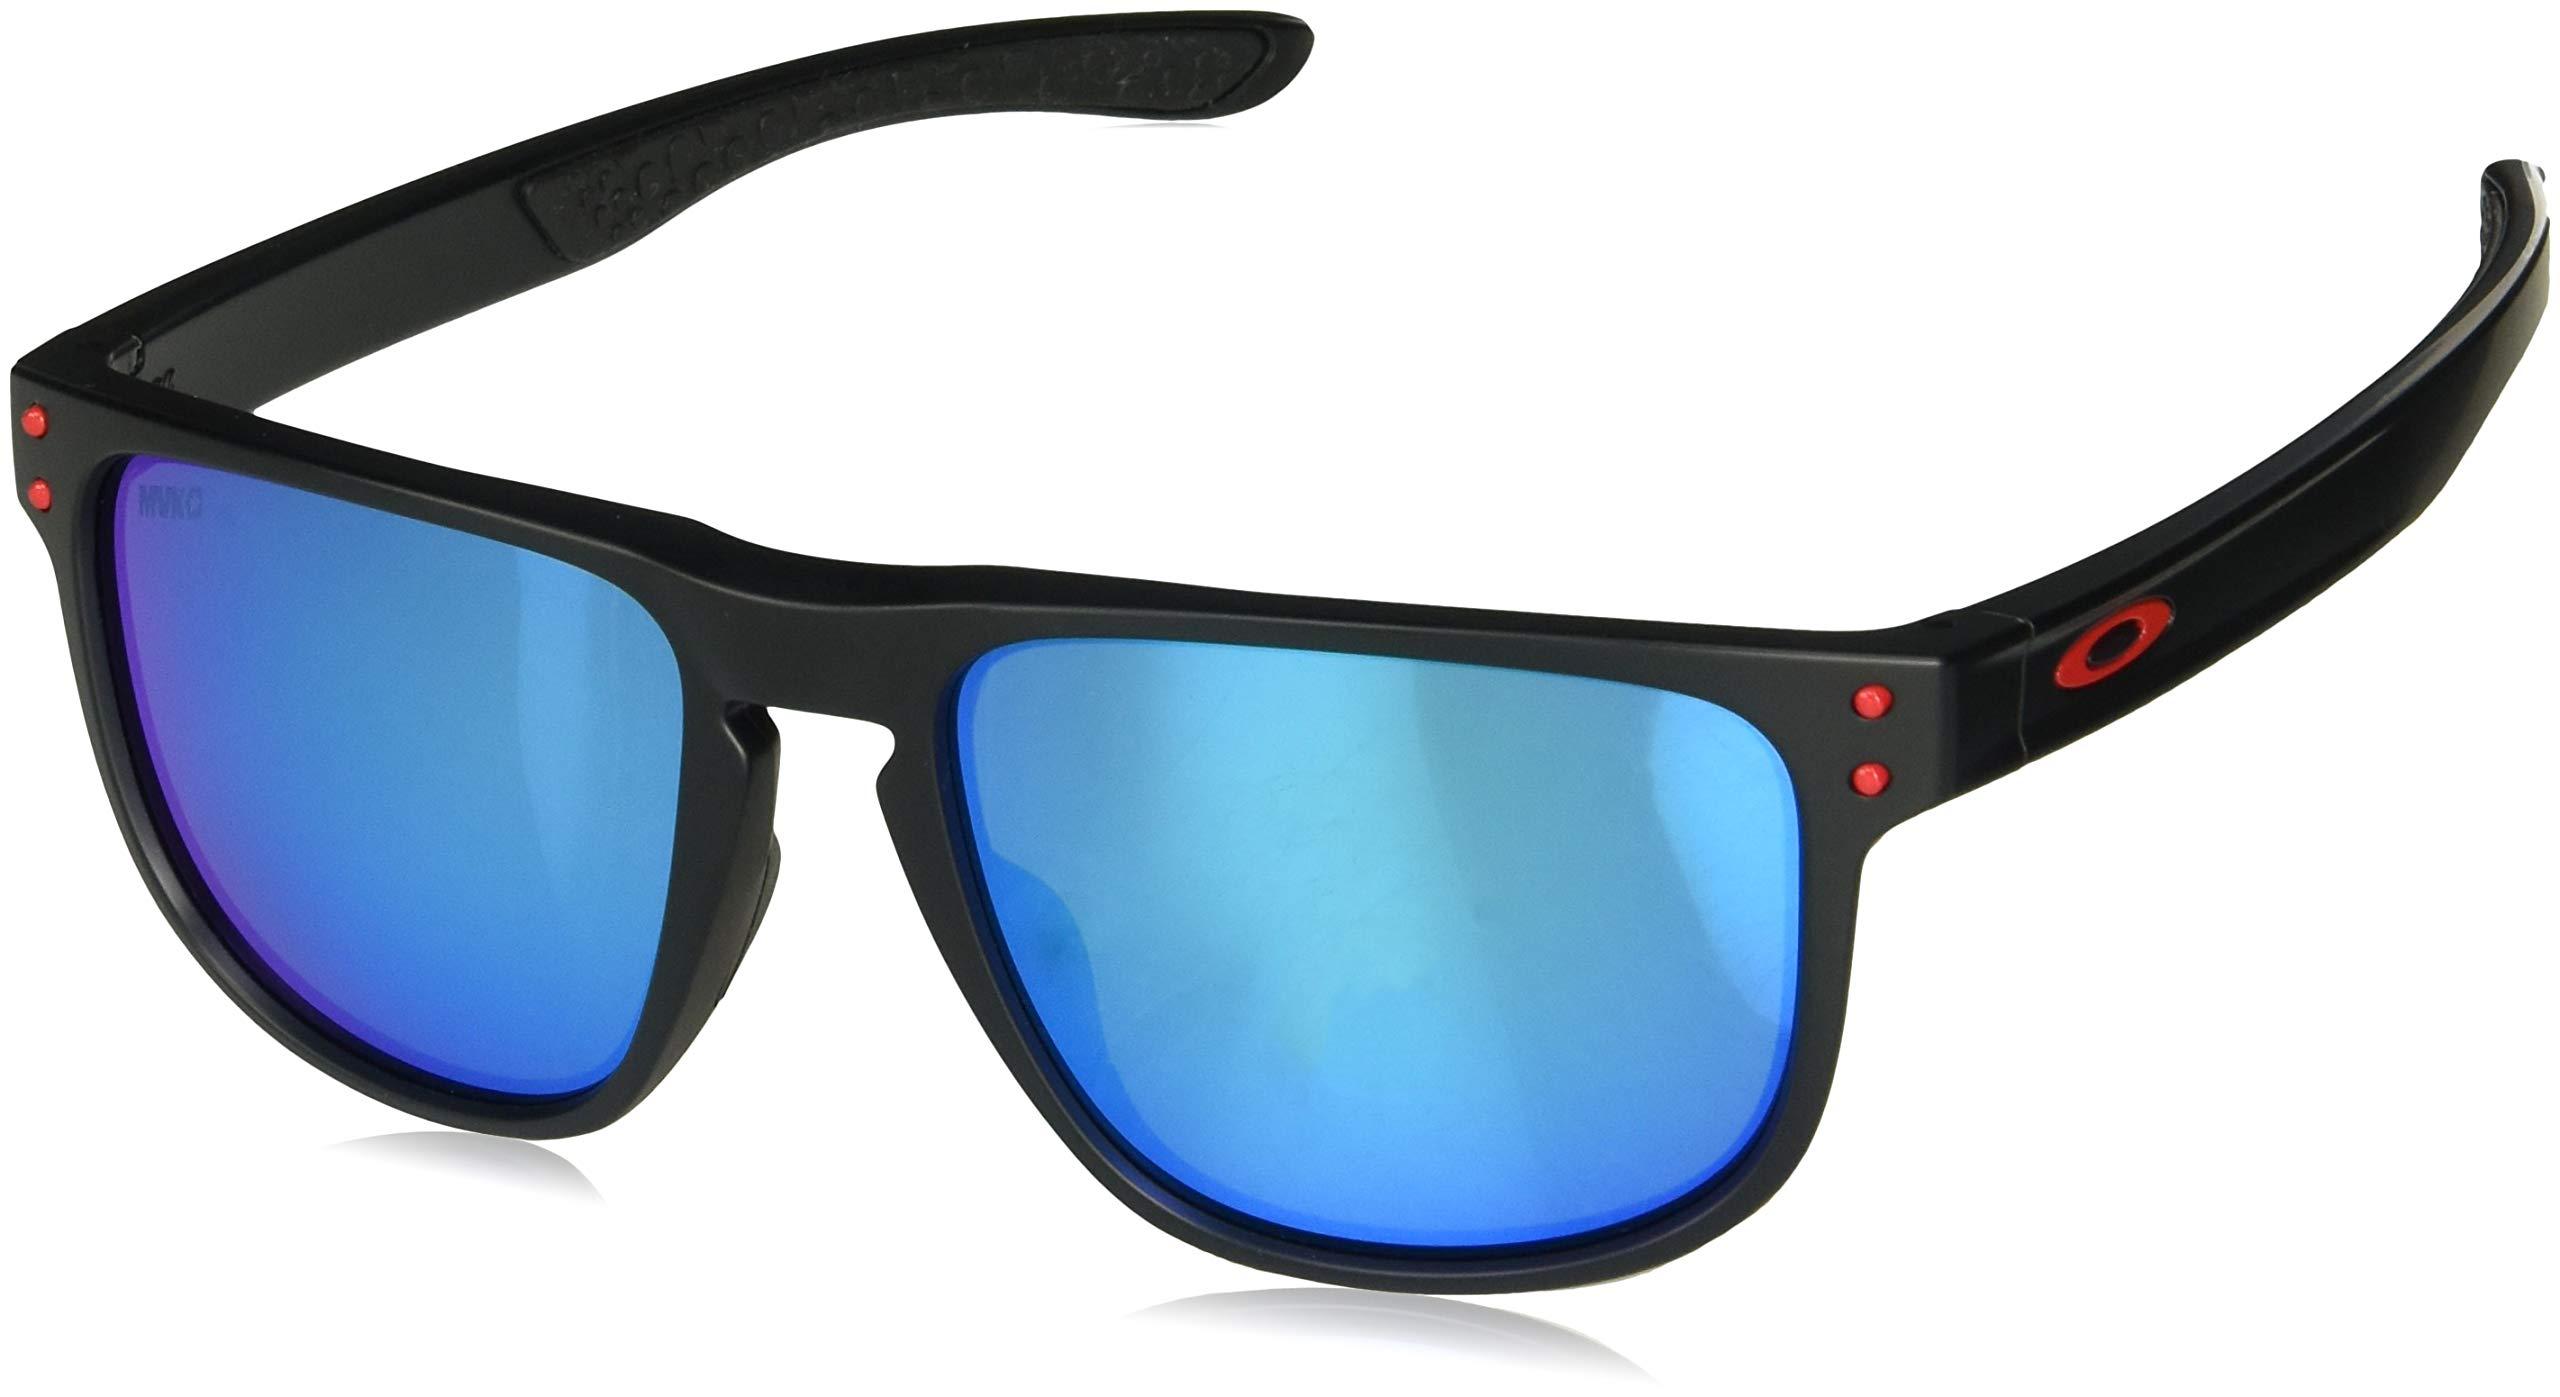 Oakley Men's OO9377 Holbrook R Square Sunglasses, Matte Black/Prizm Sapphire, 55 mm by Oakley